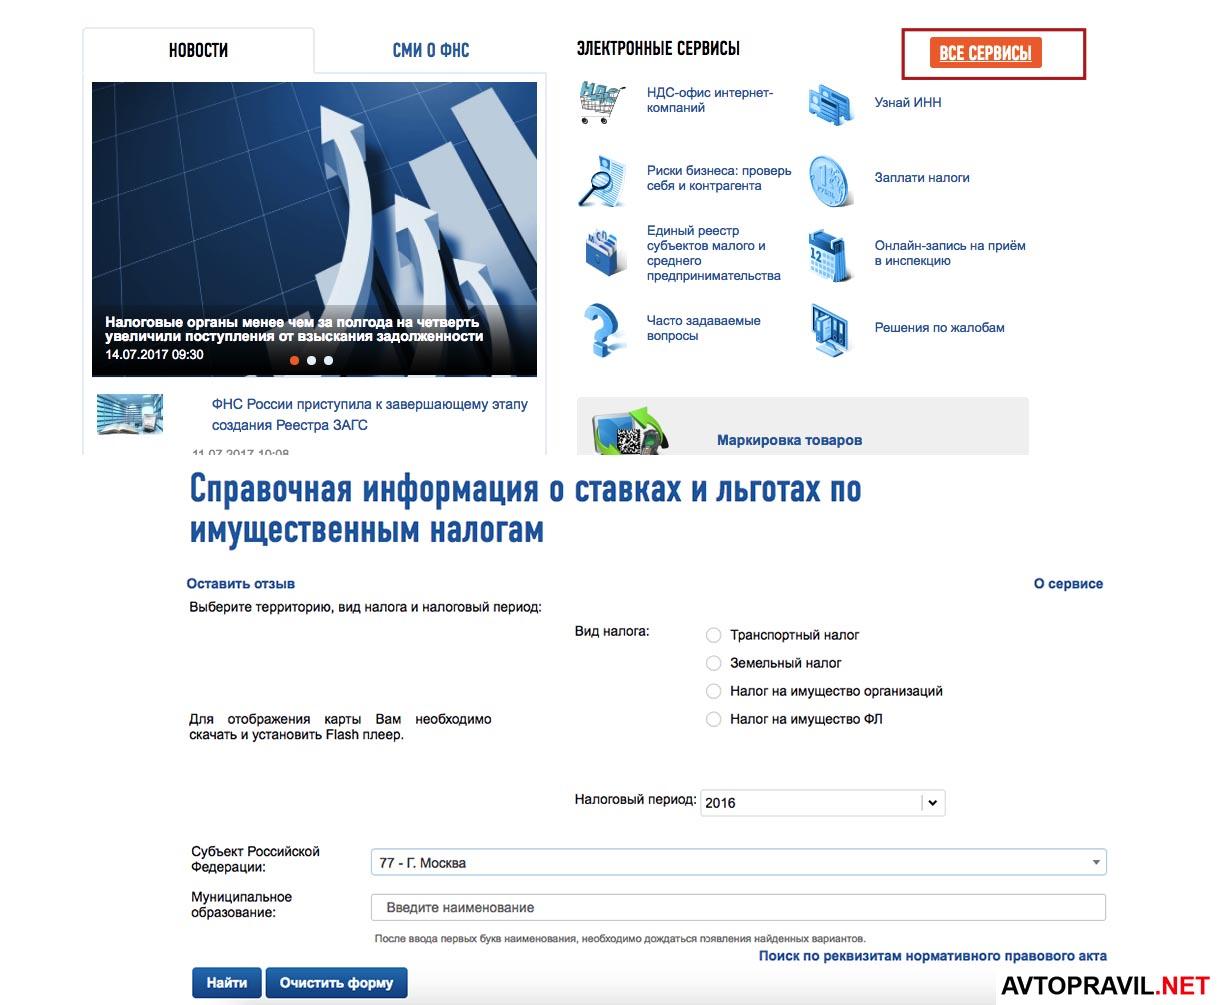 информация о ставка и льготах на сайте ФНС